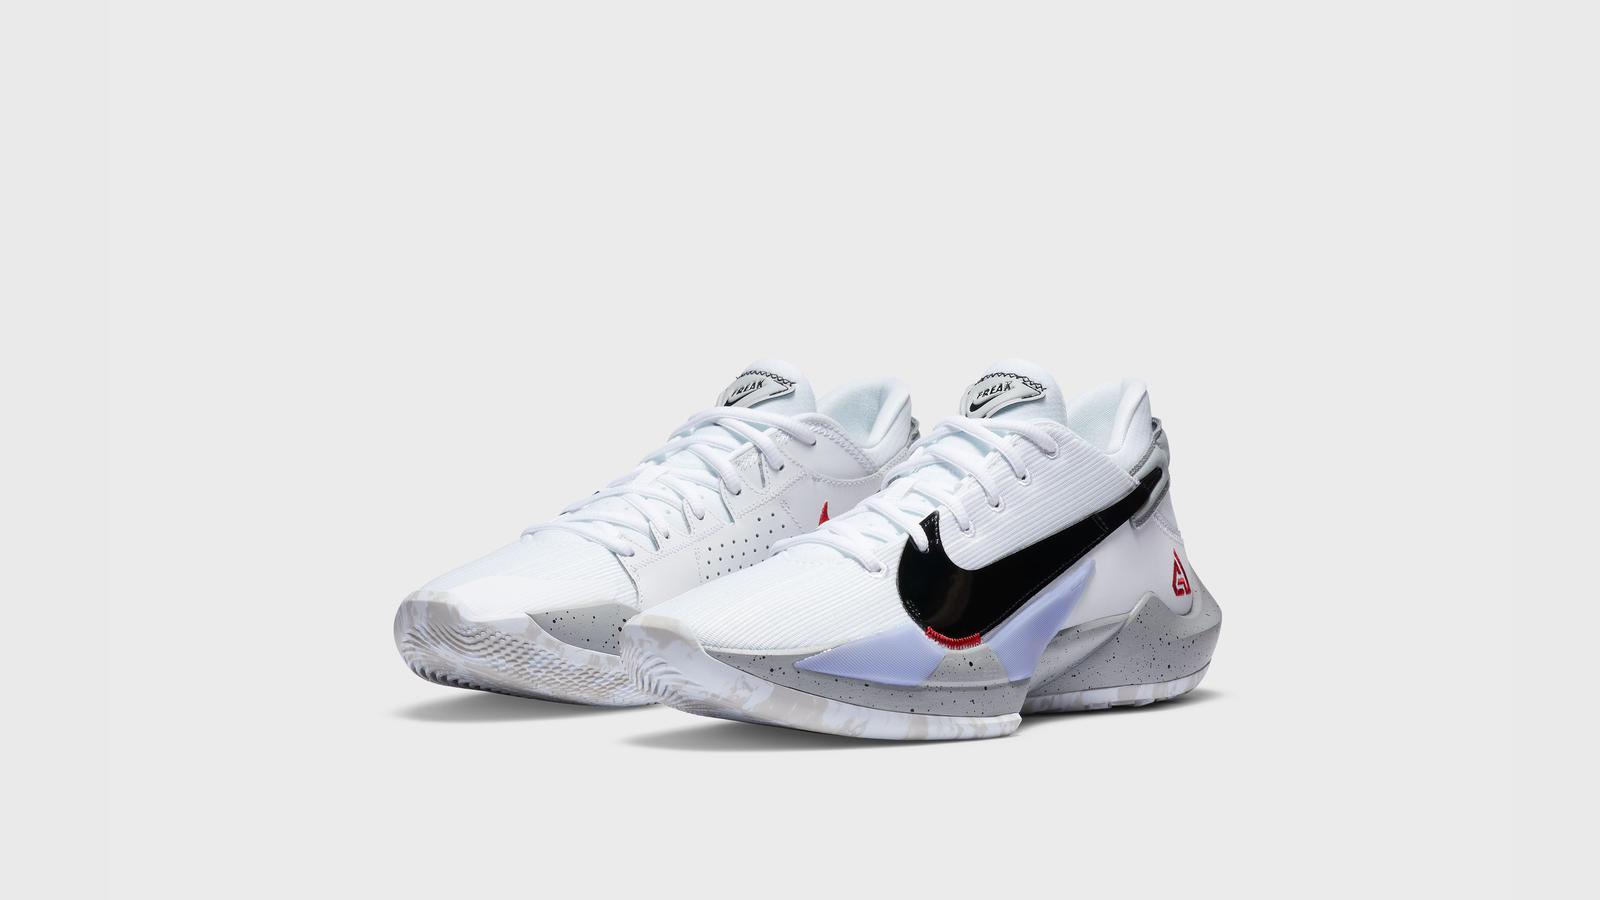 Nike Basketball Footwear NBA and WNBA